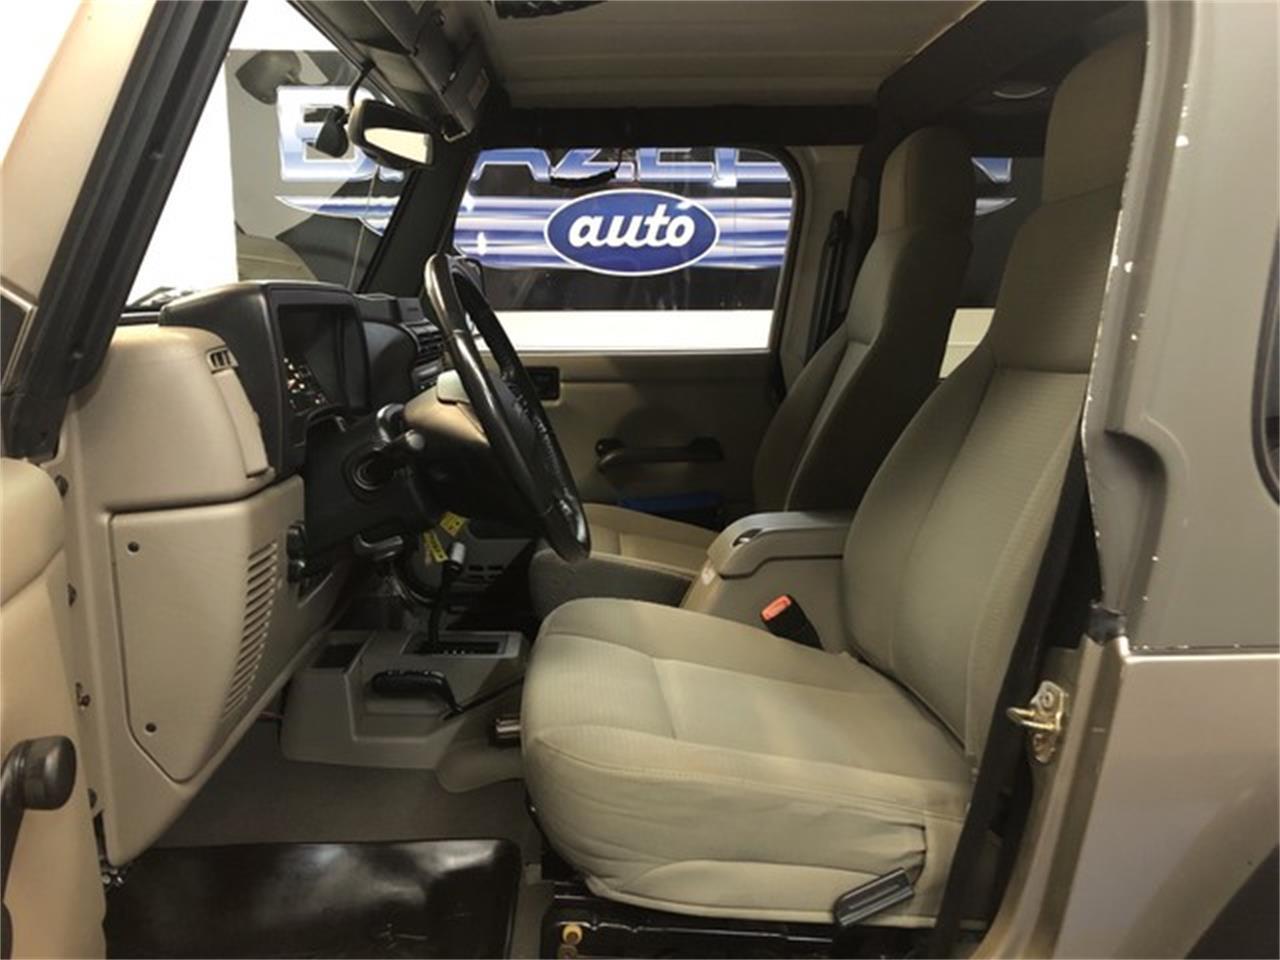 2006 Jeep Wrangler (CC-1297885) for sale in Houston, Texas